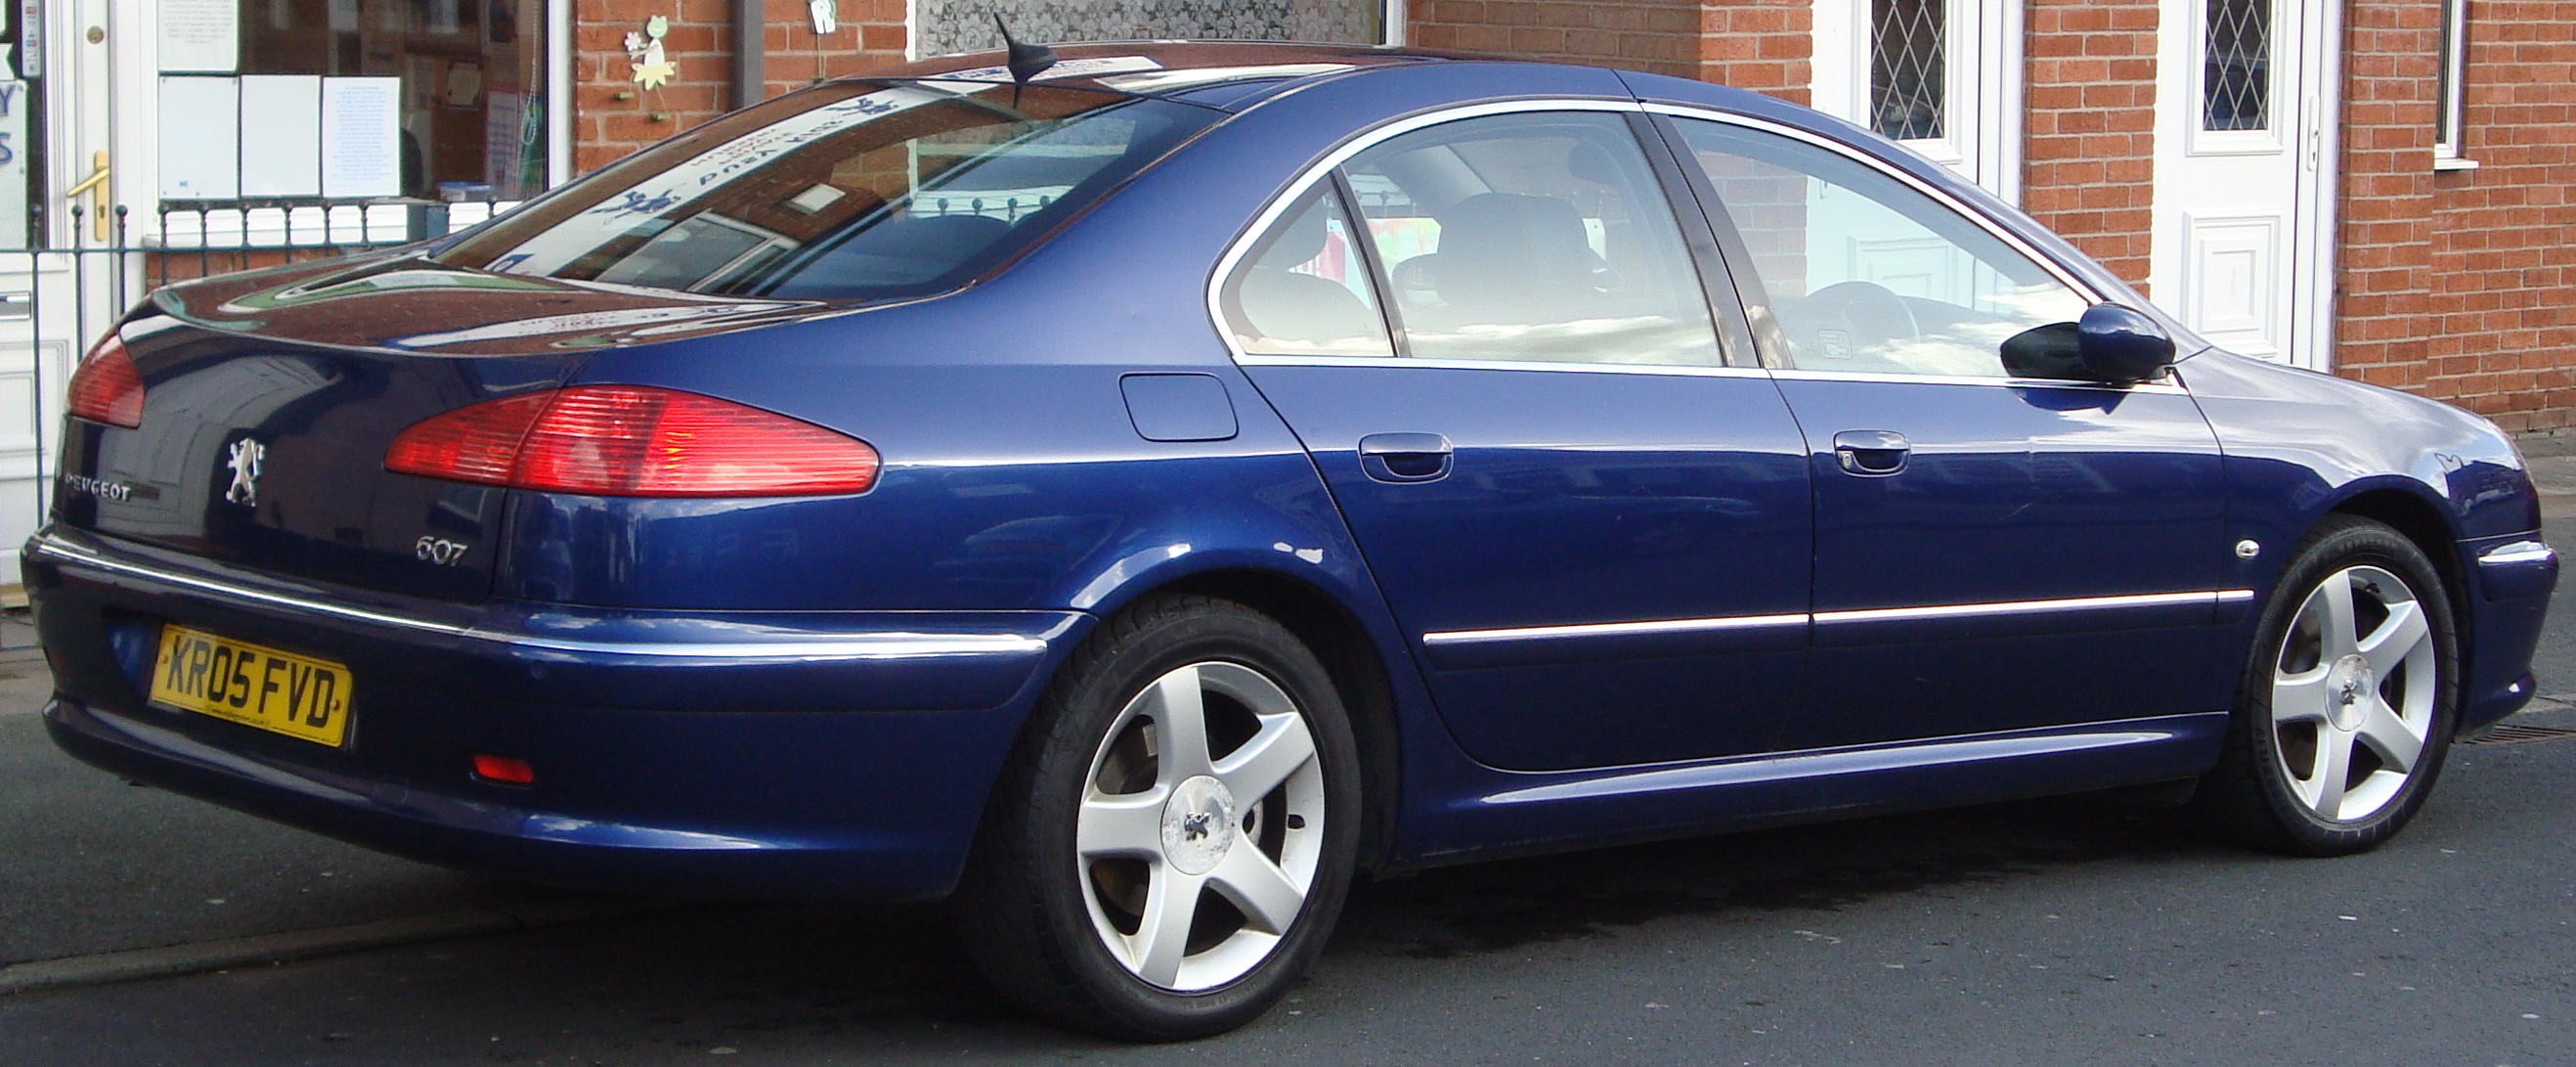 File:2005 Peugeot 607 SE HDI (12839729134).jpg